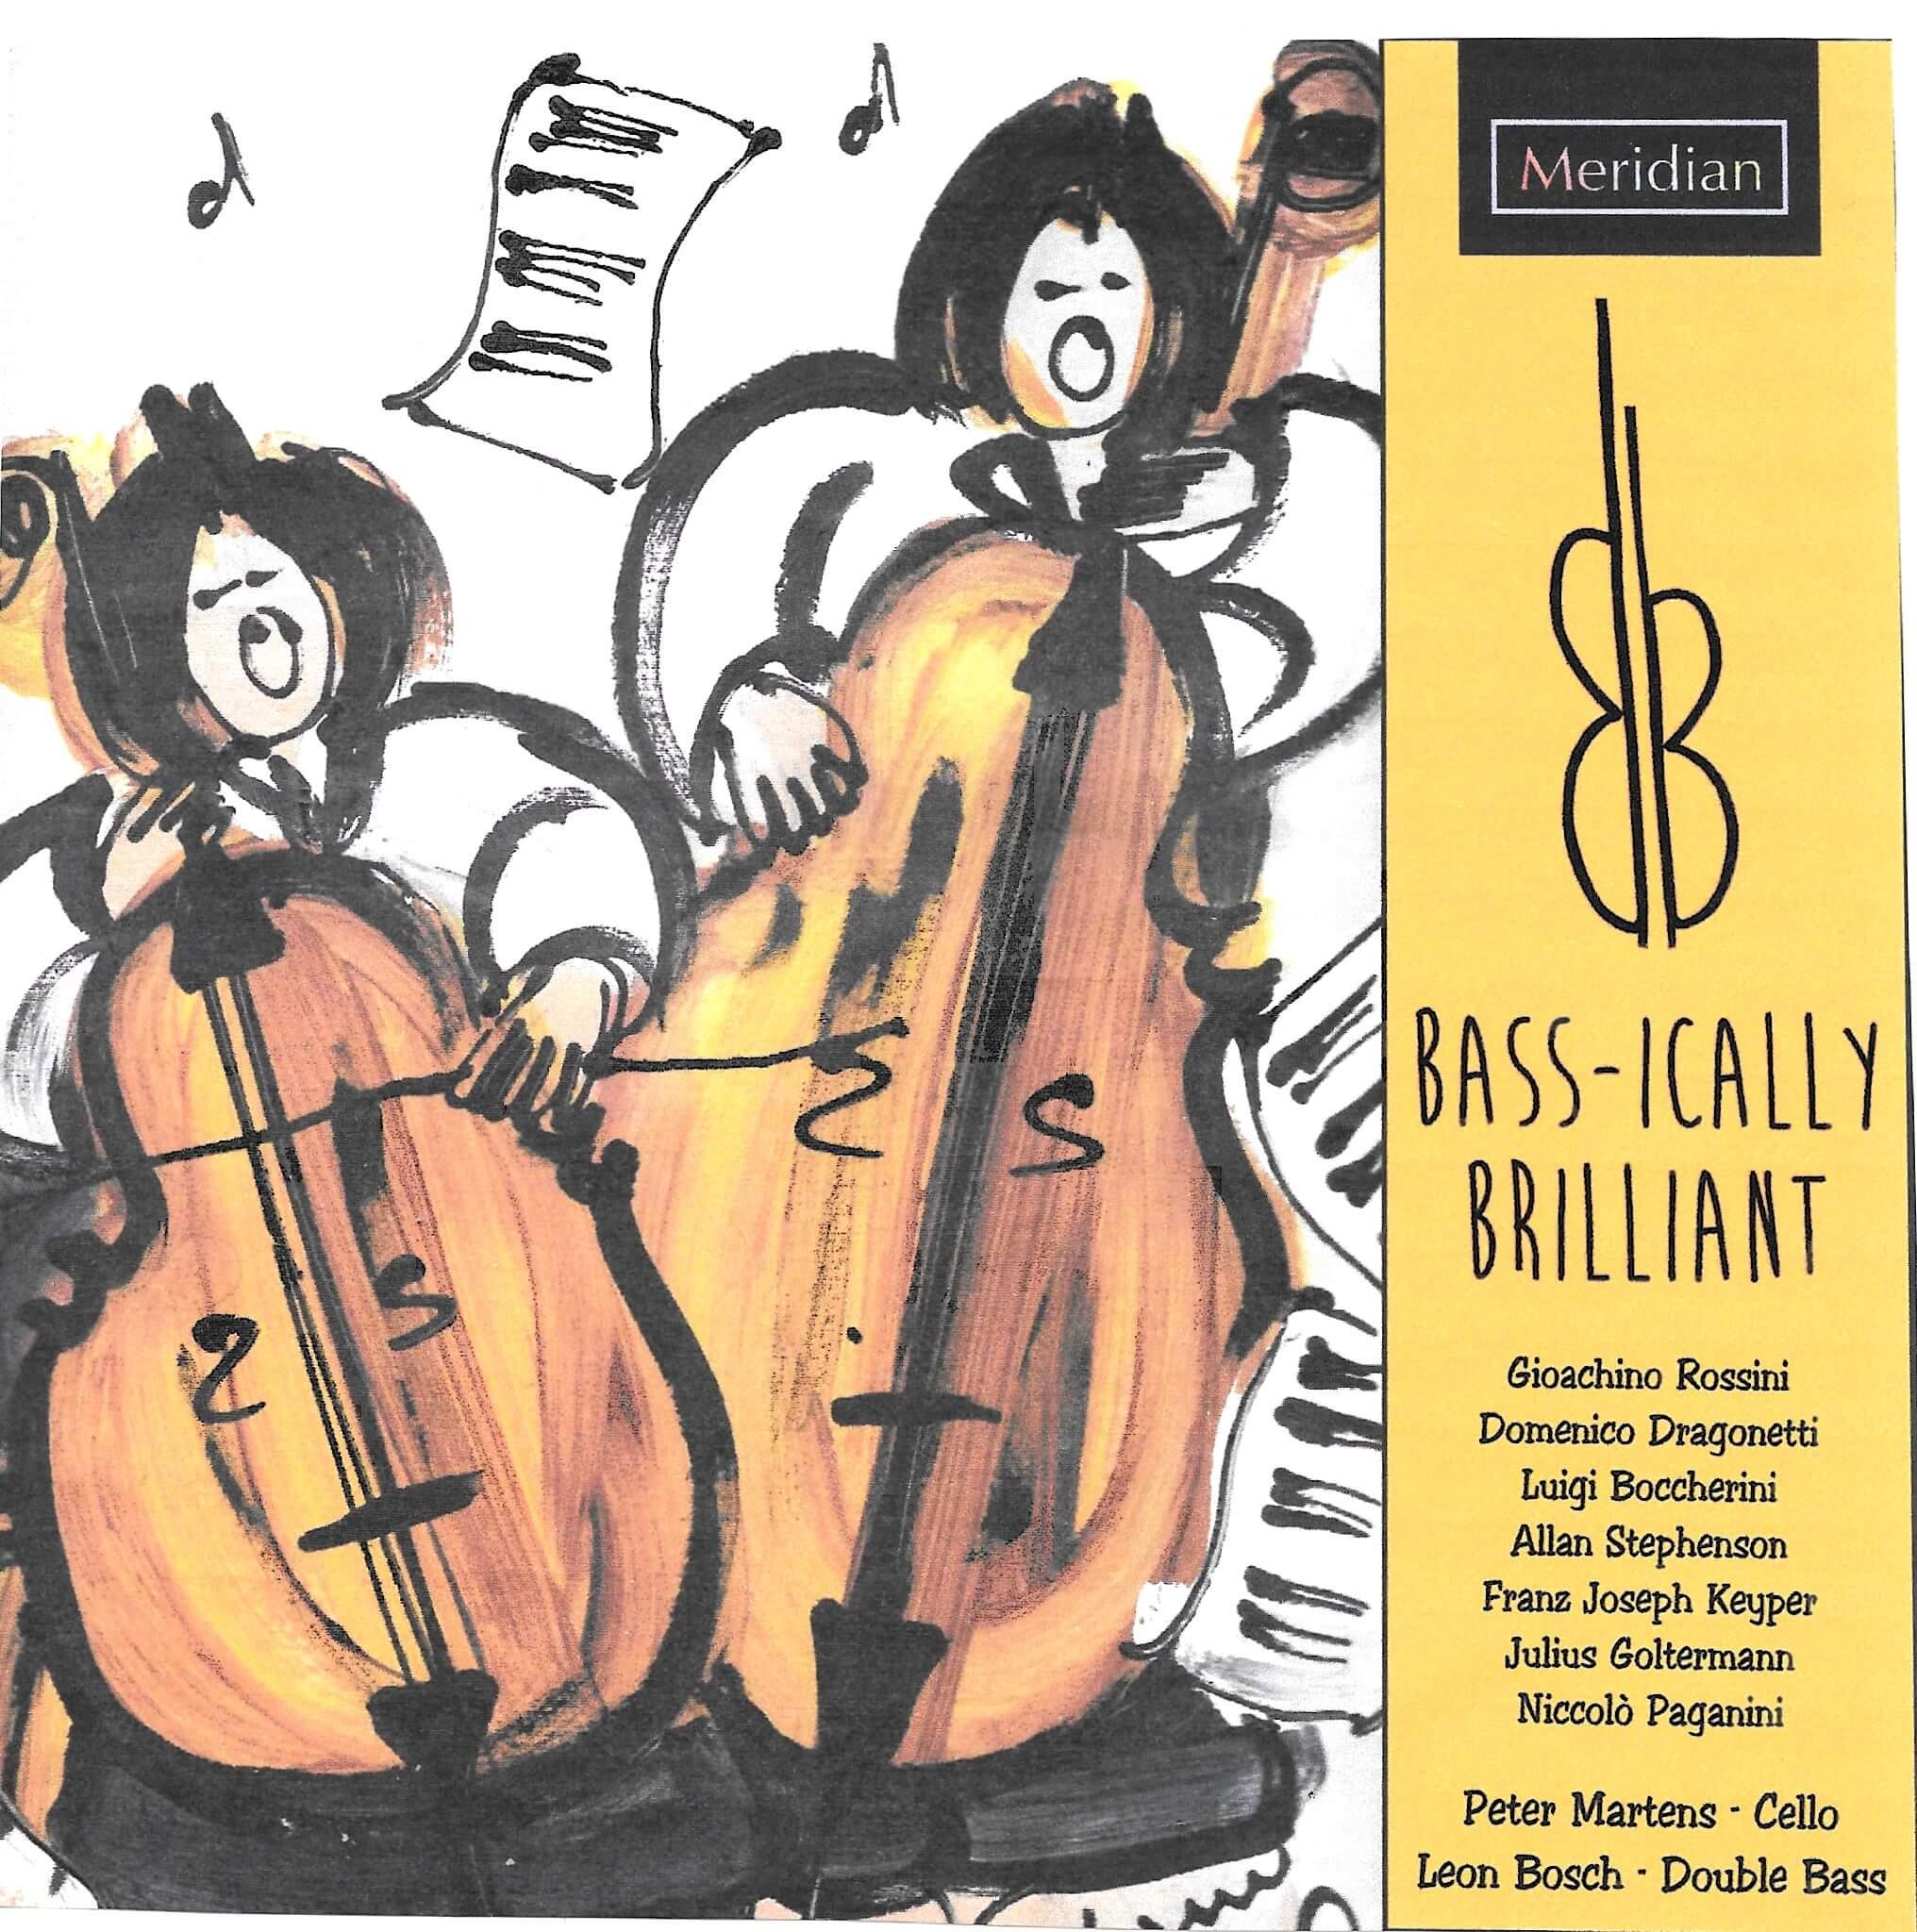 The album art of Leon Bosch & Peter Martens' album titled 'Bass-ically Brilliant'